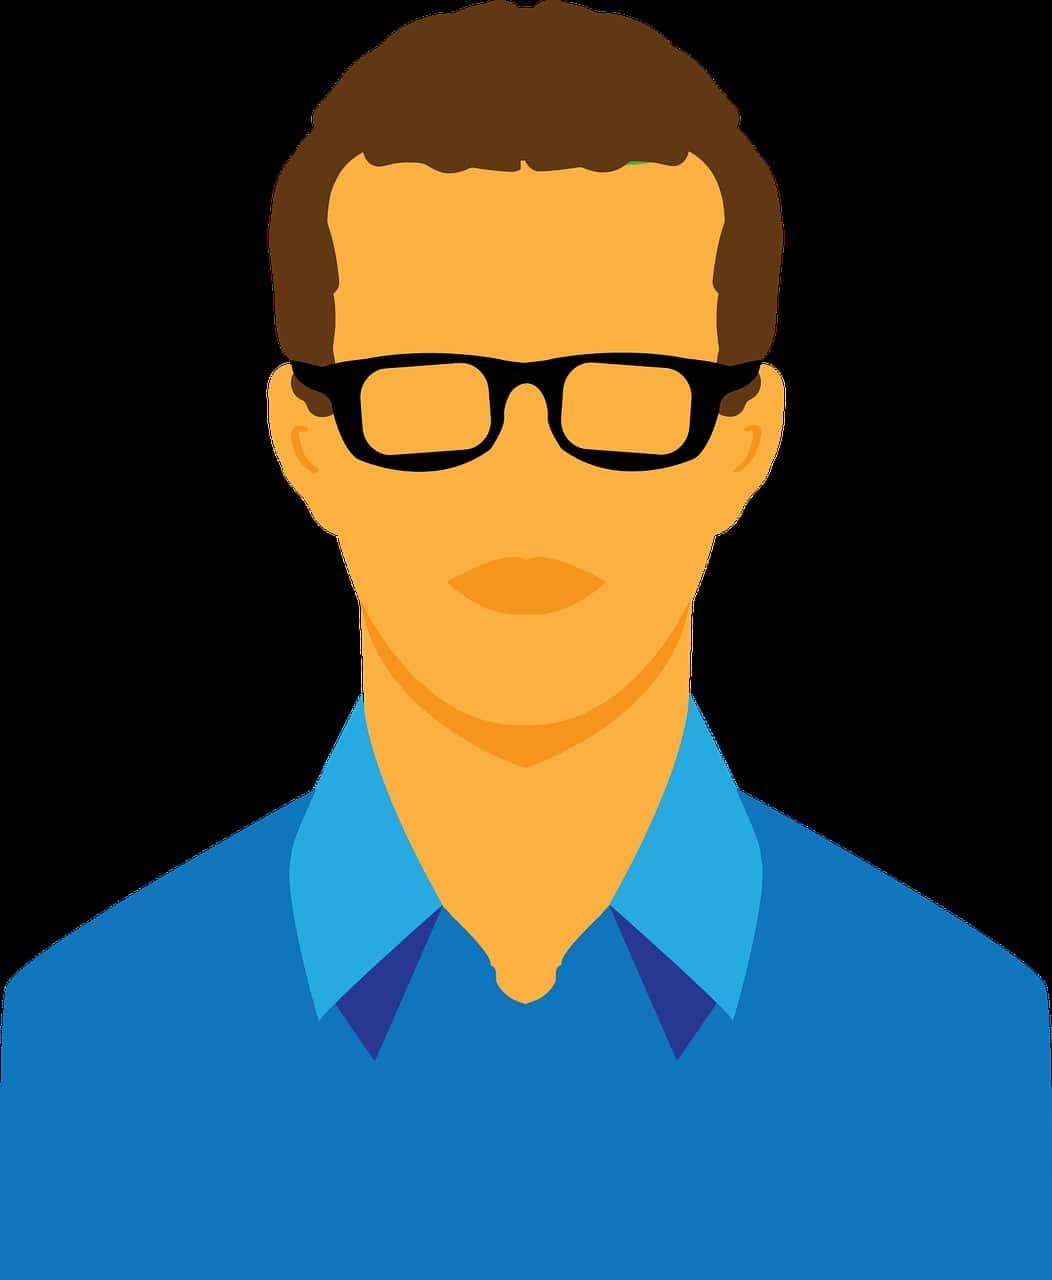 avatar boy cartoon 2027366